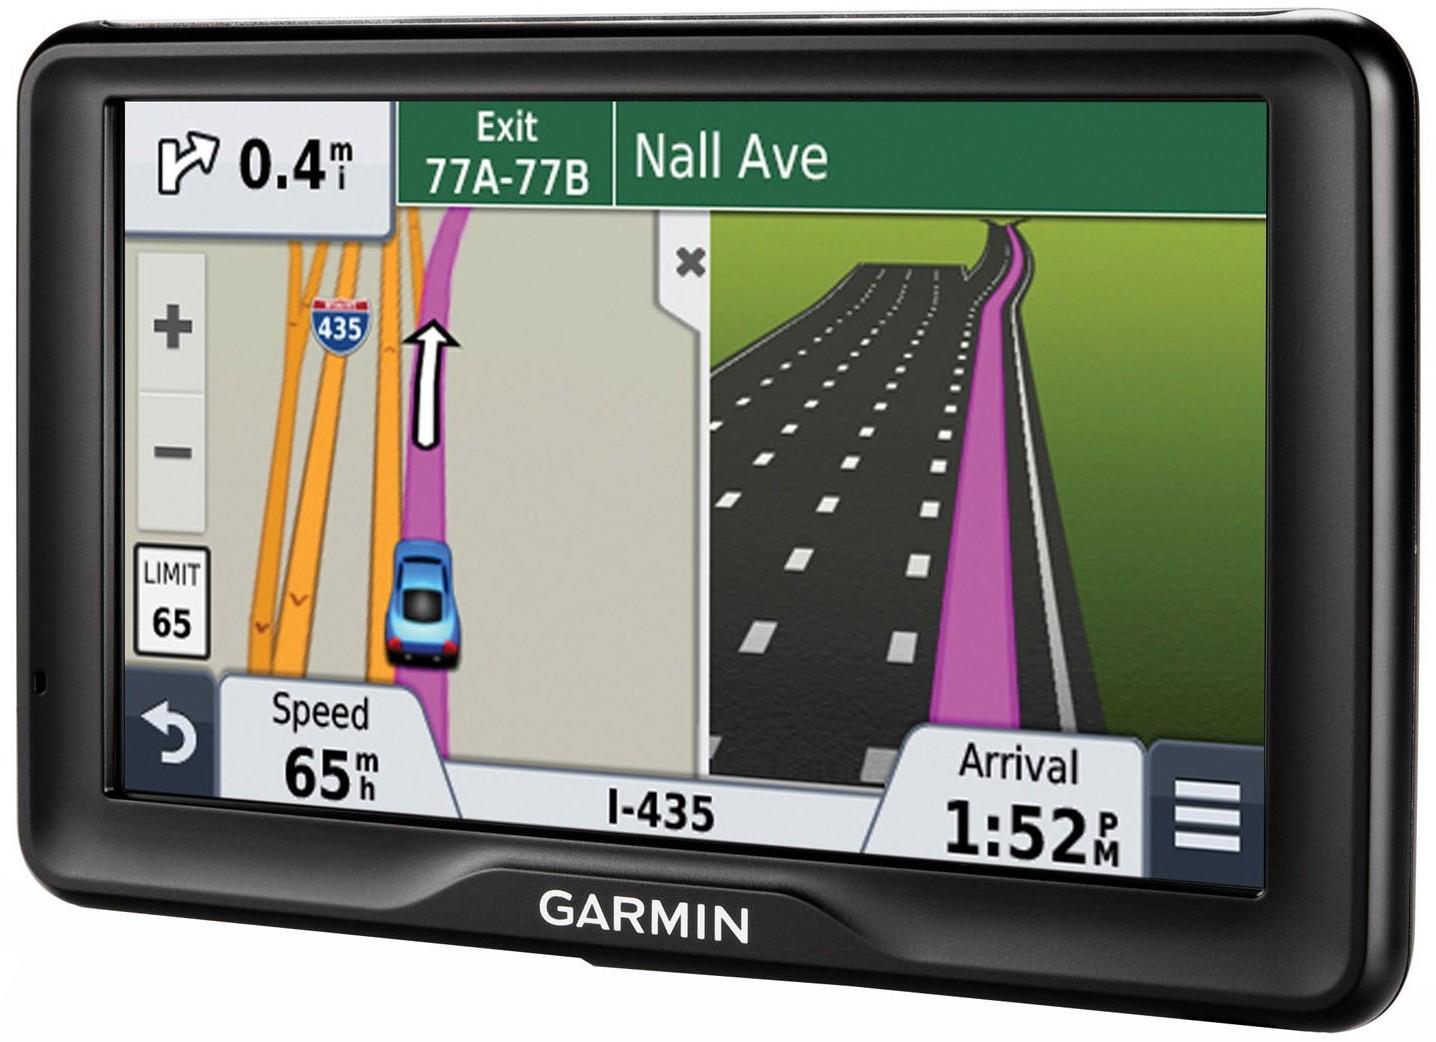 Garmin Nuvi 2797LMT GPS